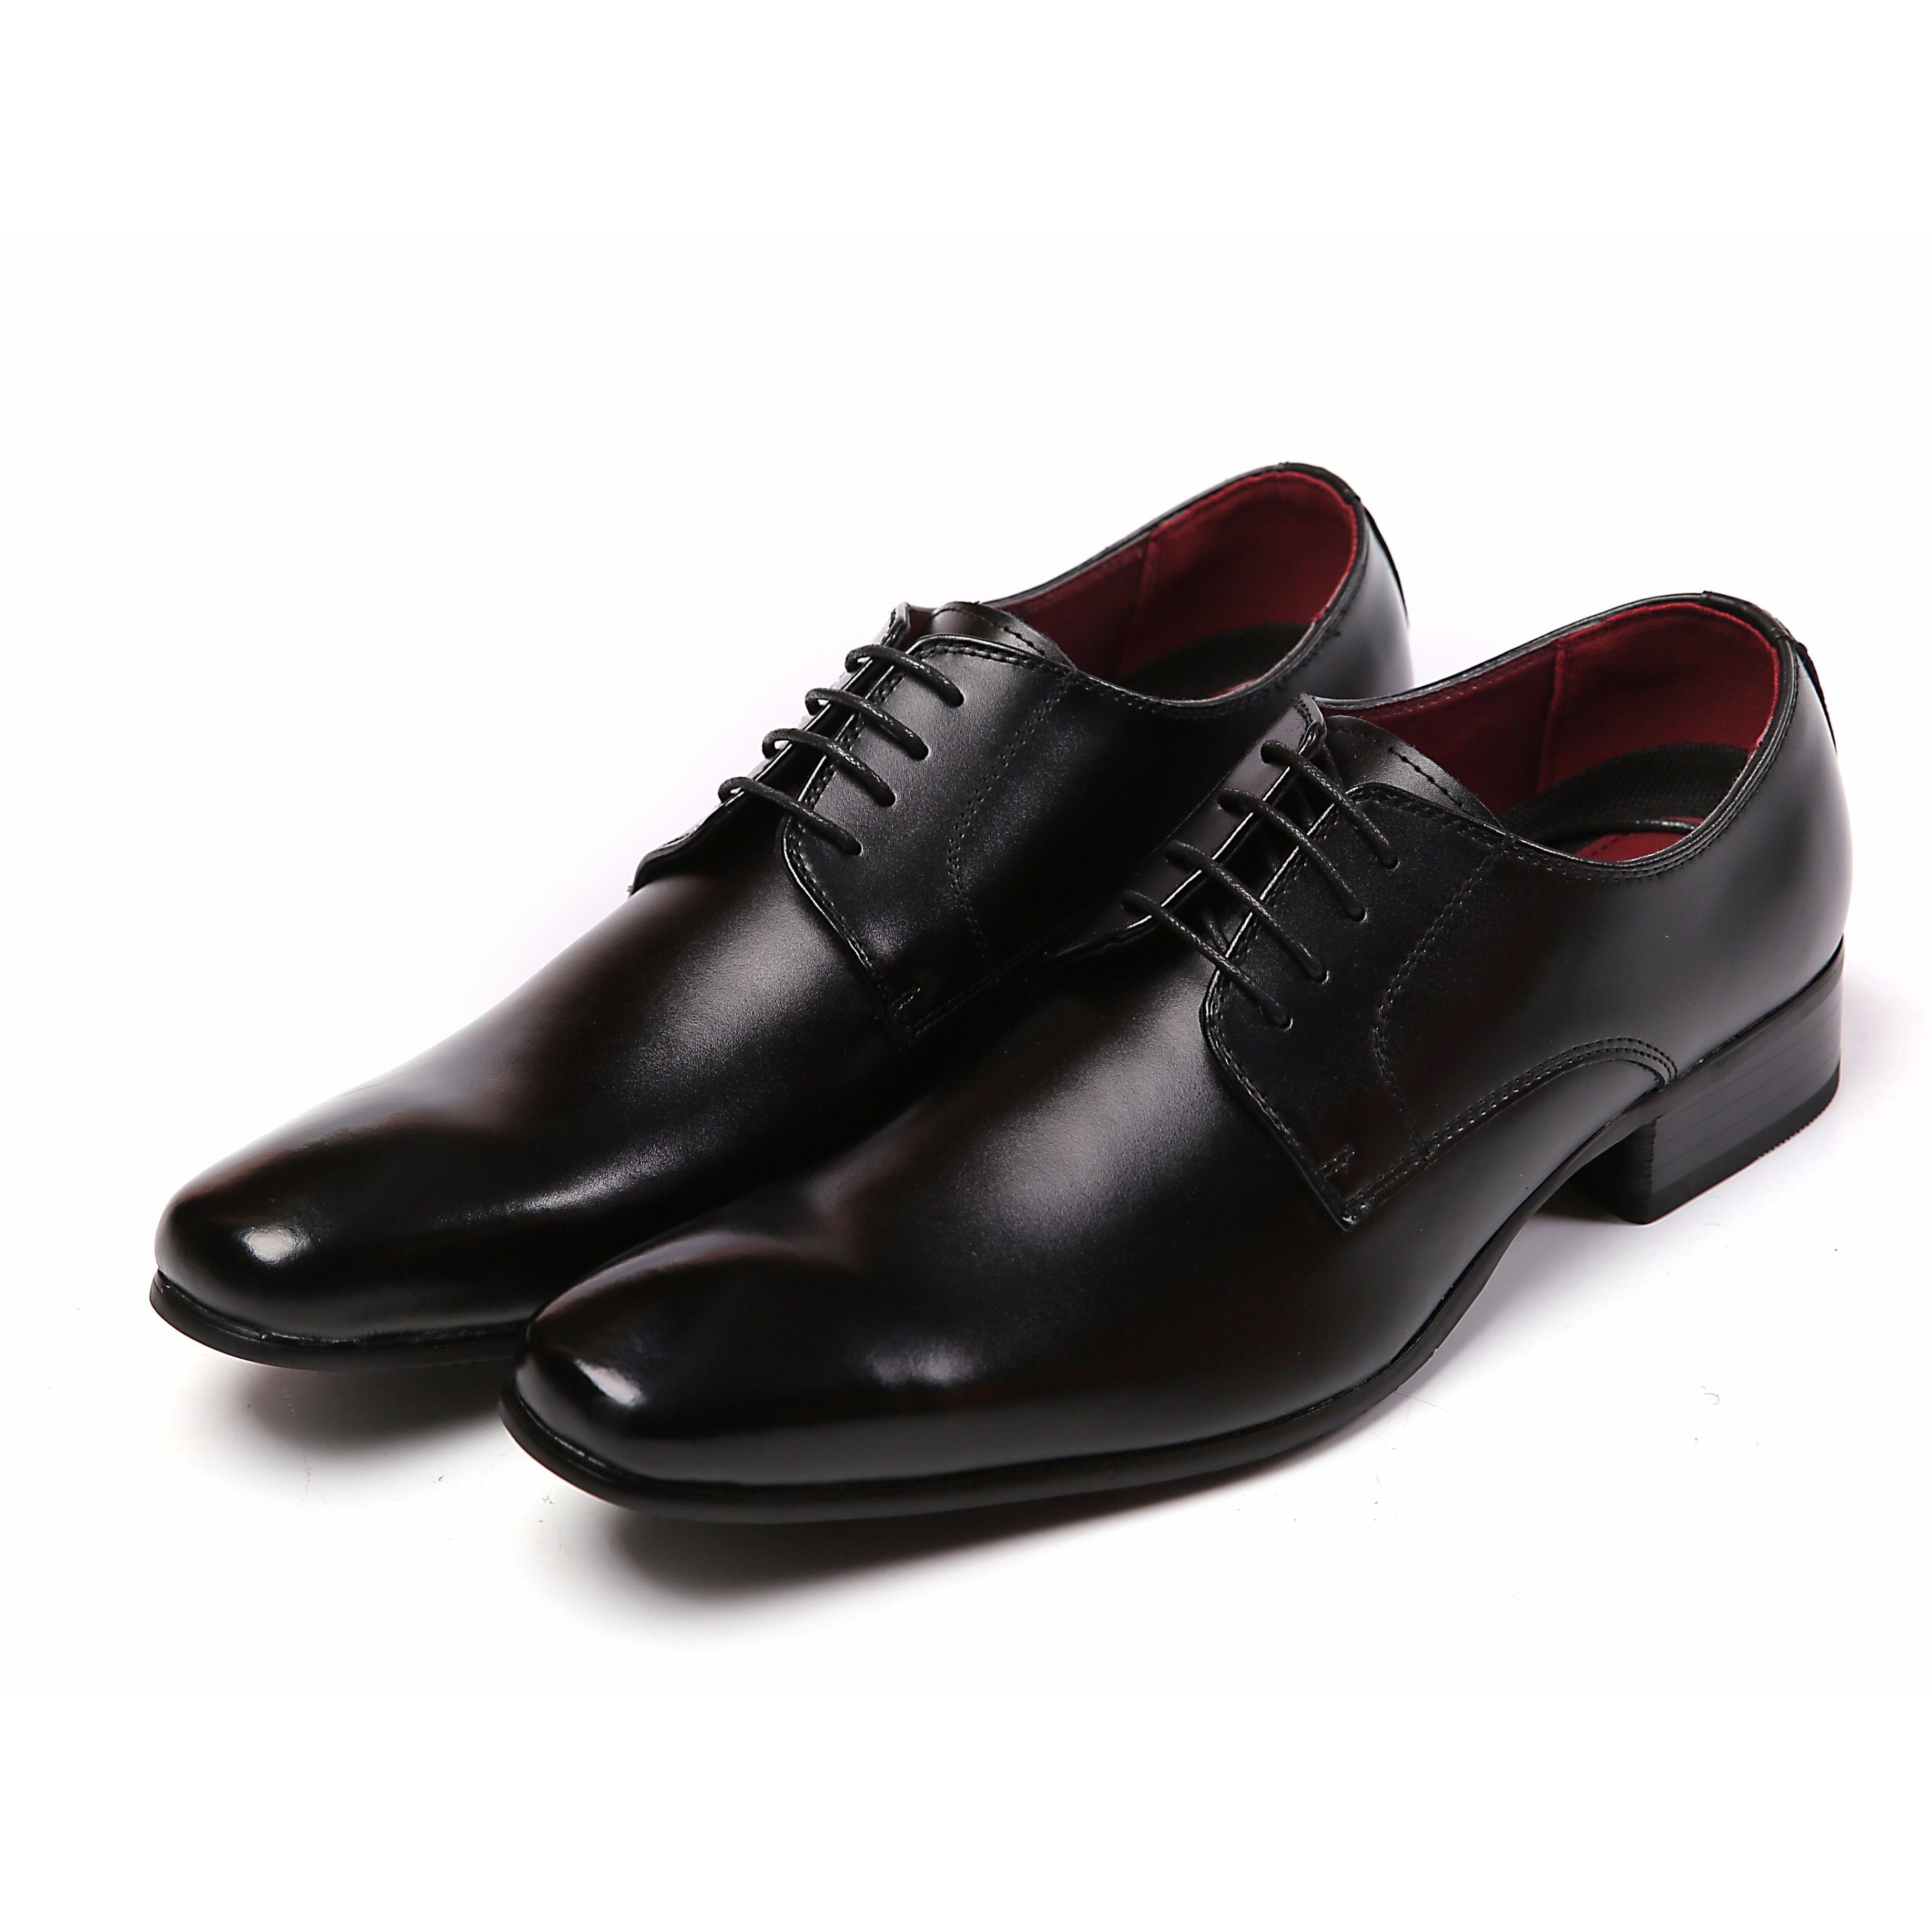 【Jo Marino】 高品質 本革 メンズ 革靴 ビジネスシューズ 紳士靴 防滑 撥水アッパー 高反発インソール 3E 多機能-779-BLACK